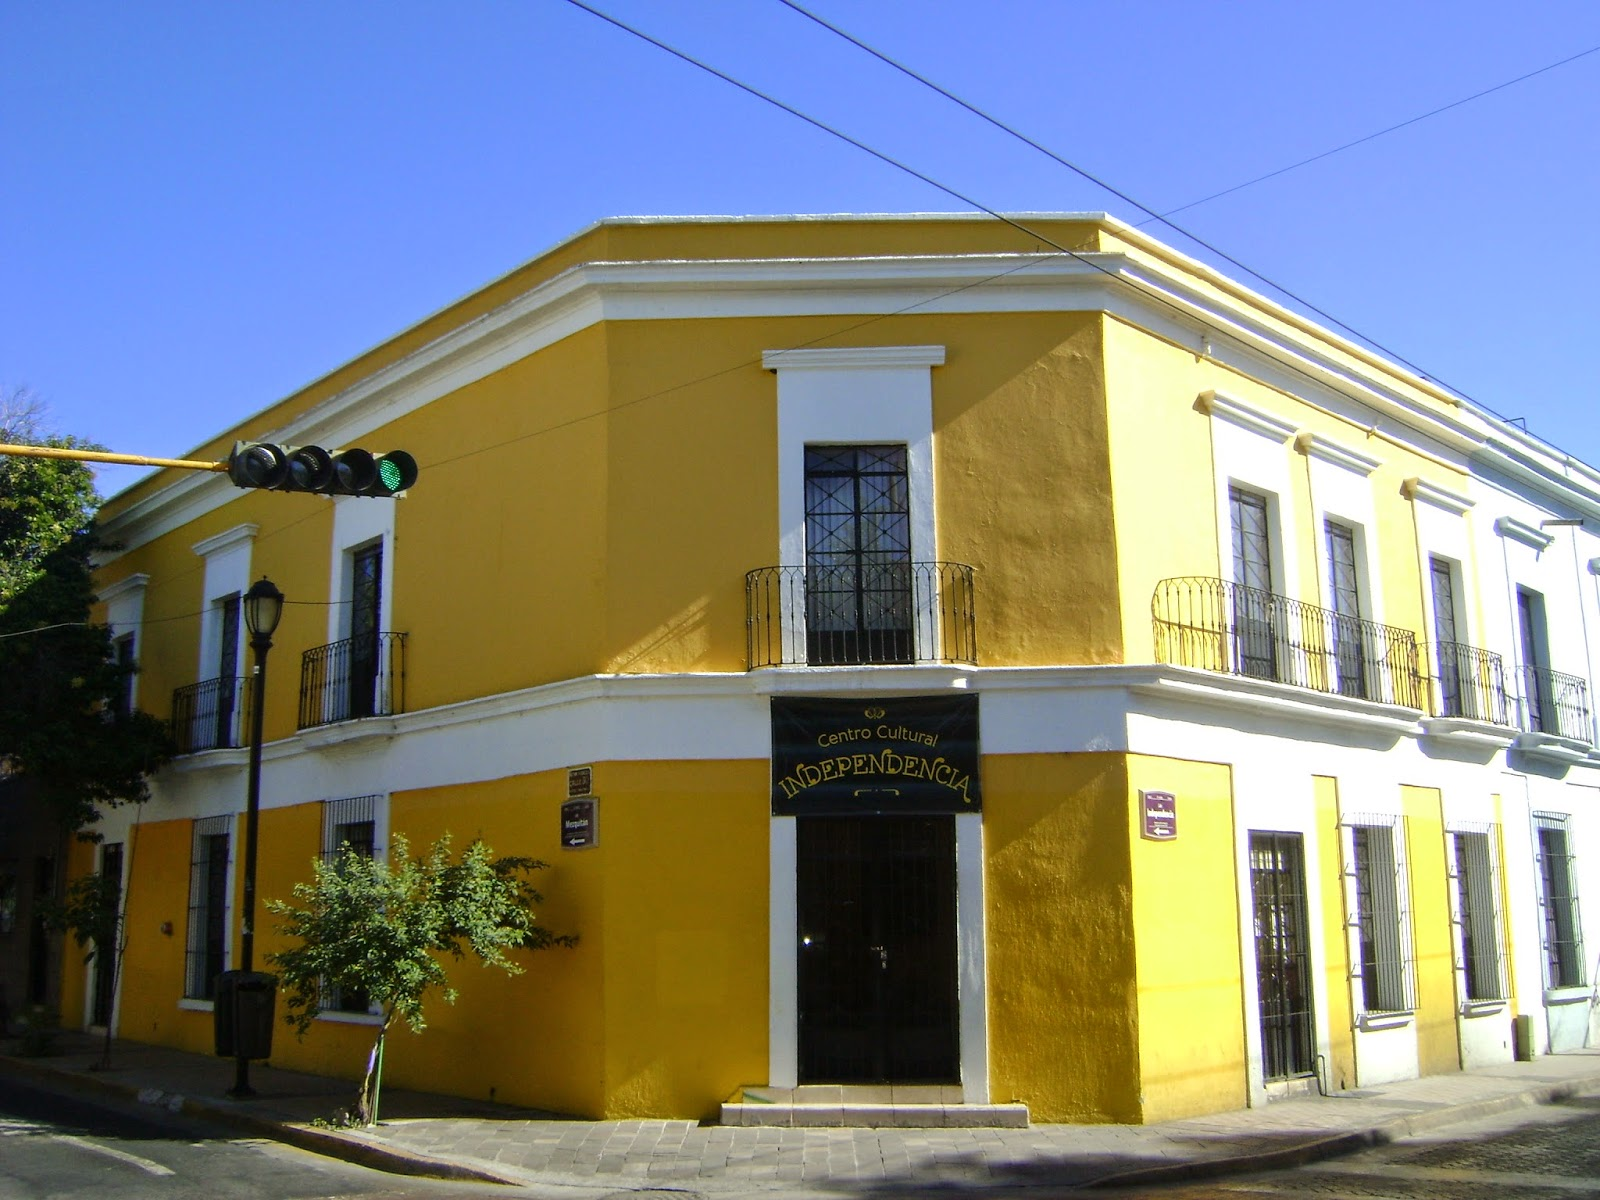 Sancarlosfortin centro cultural en ex casa amarilla en for Casa amarilla musica